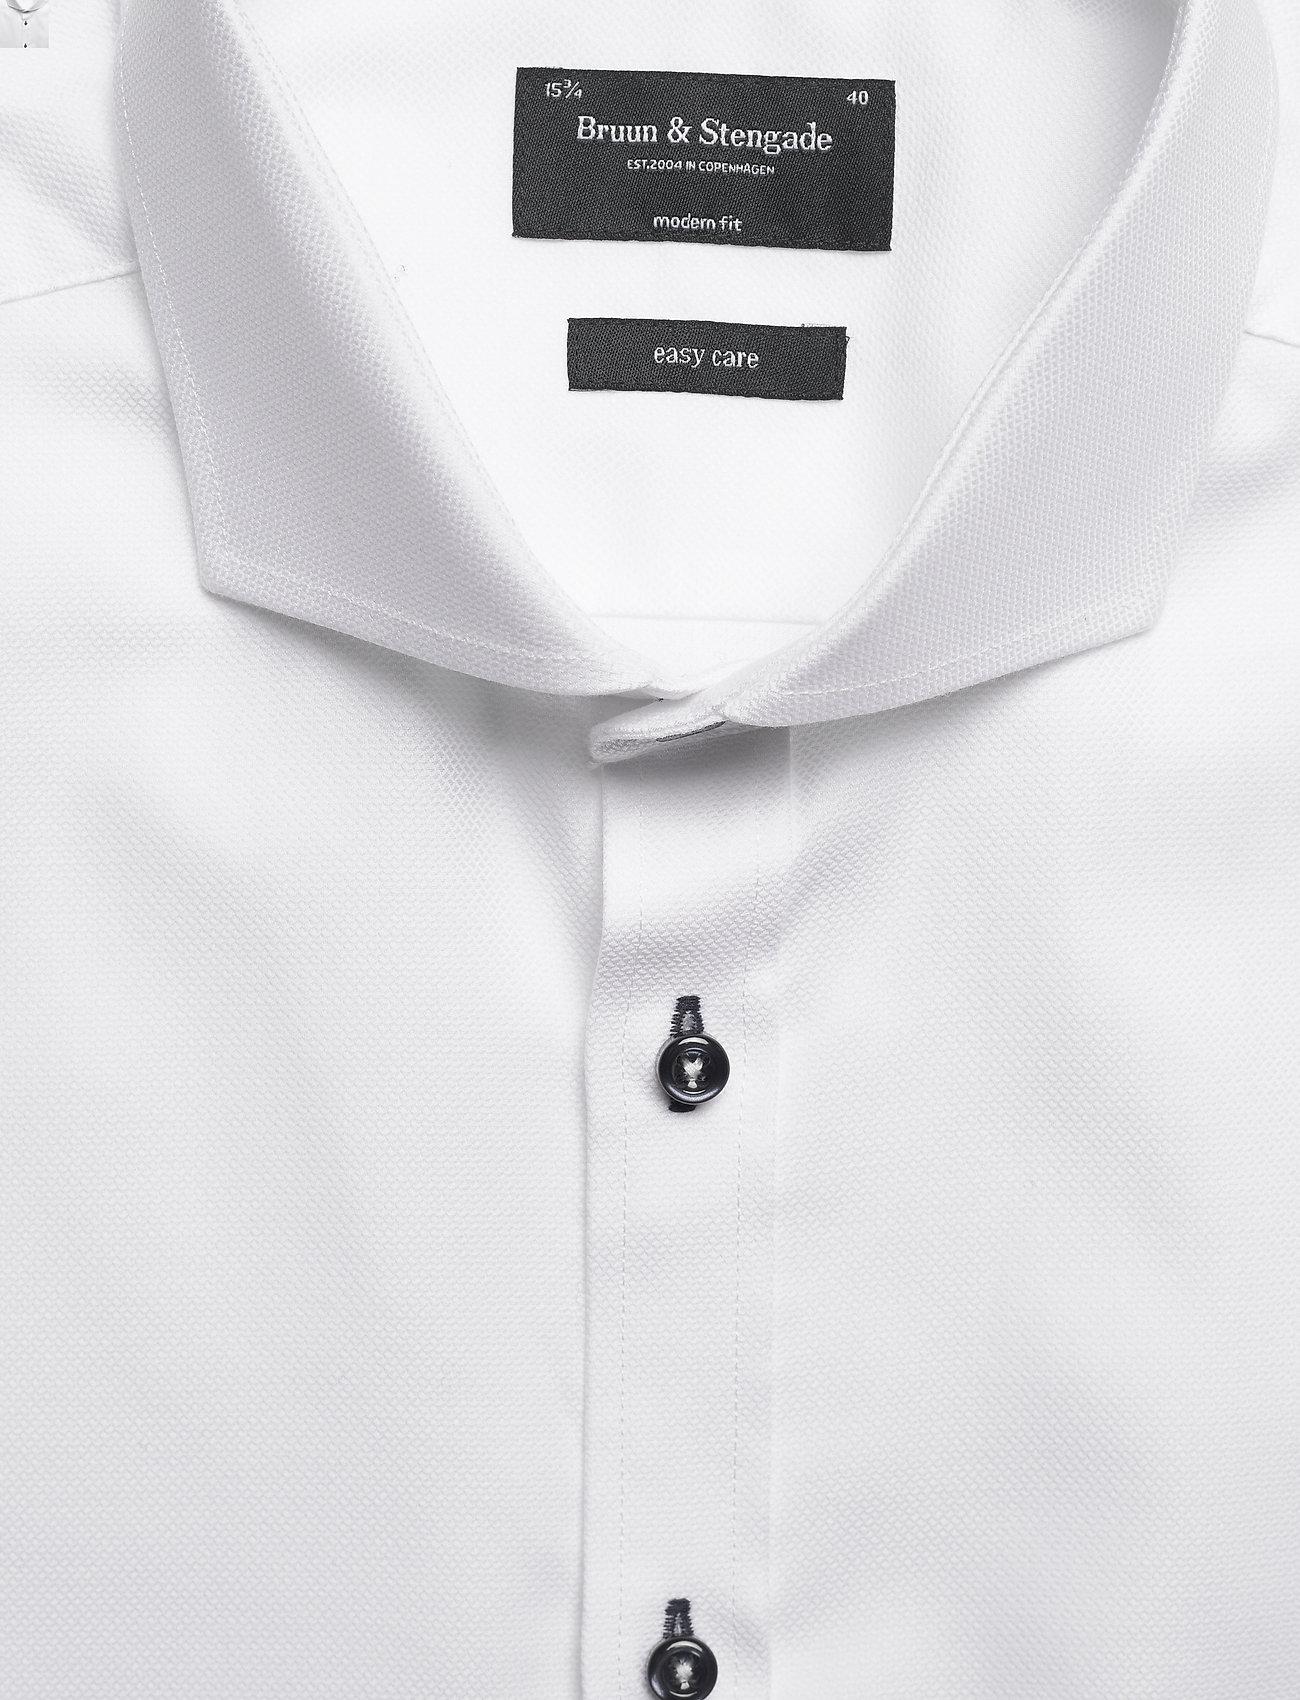 Klopp (White) (34.97 €) - Bruun & Stengade 6WFlB